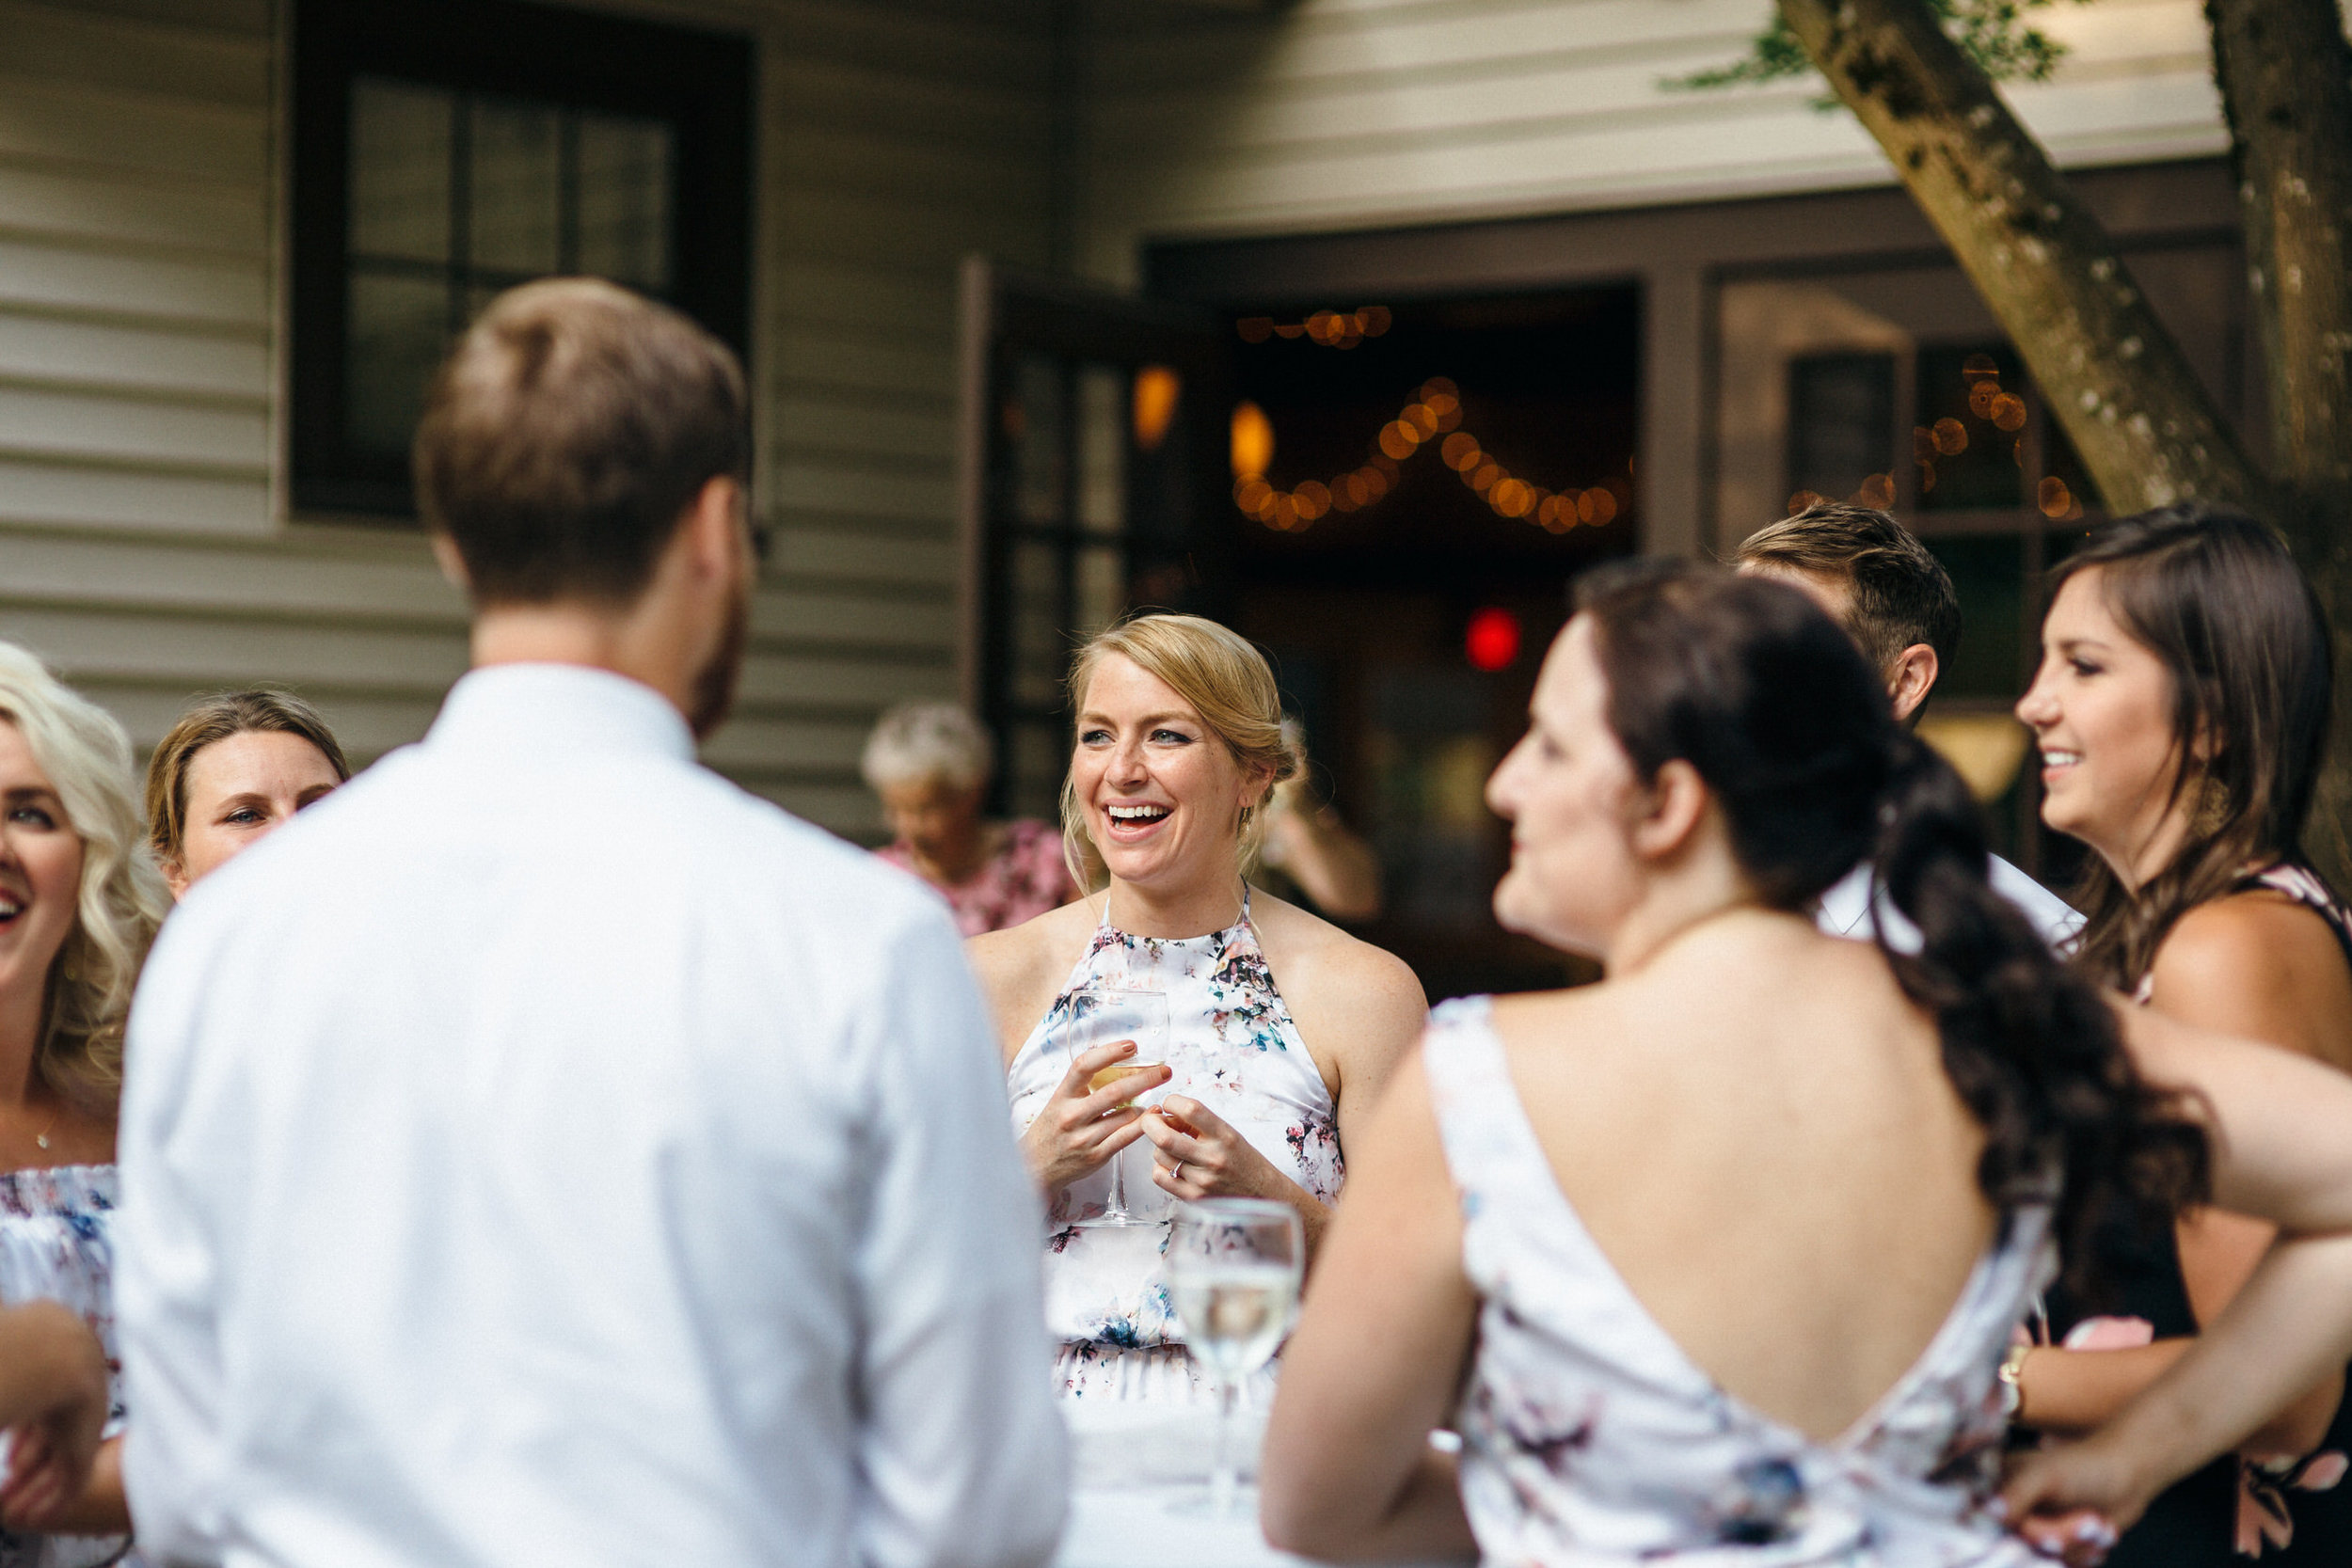 Laurelhurst Park club wedding photographer Portand pdx Oregon108.JPG